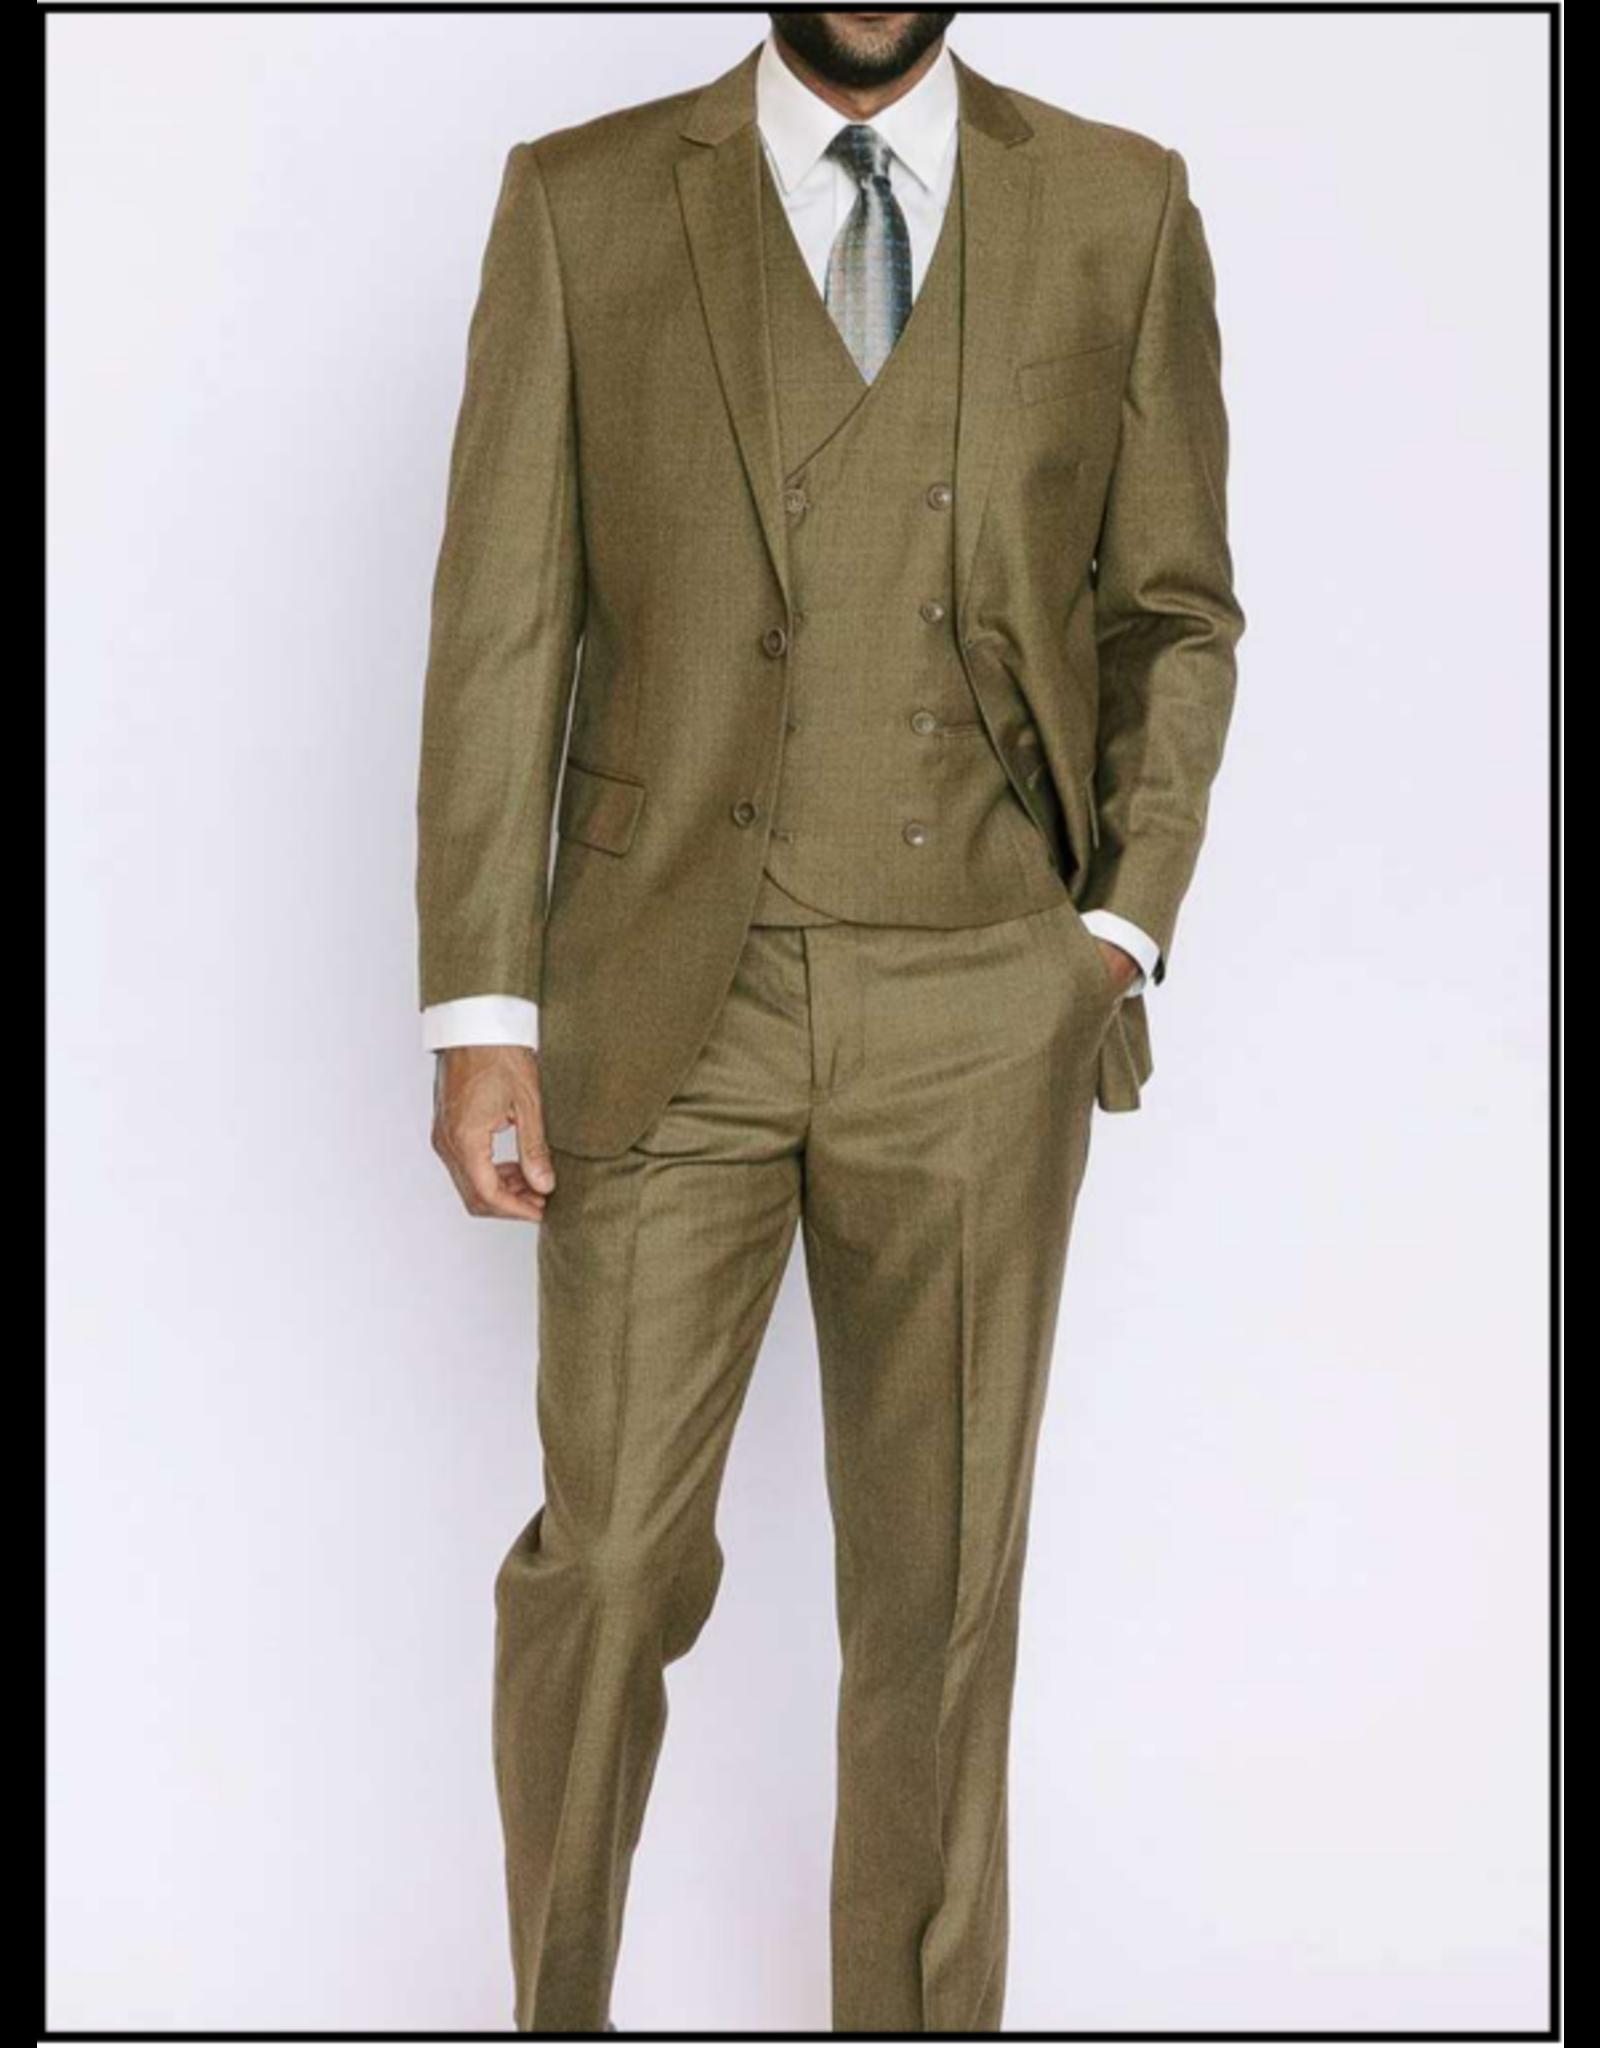 Mazzari Mazzari Vested Suit - 6100S Mustard